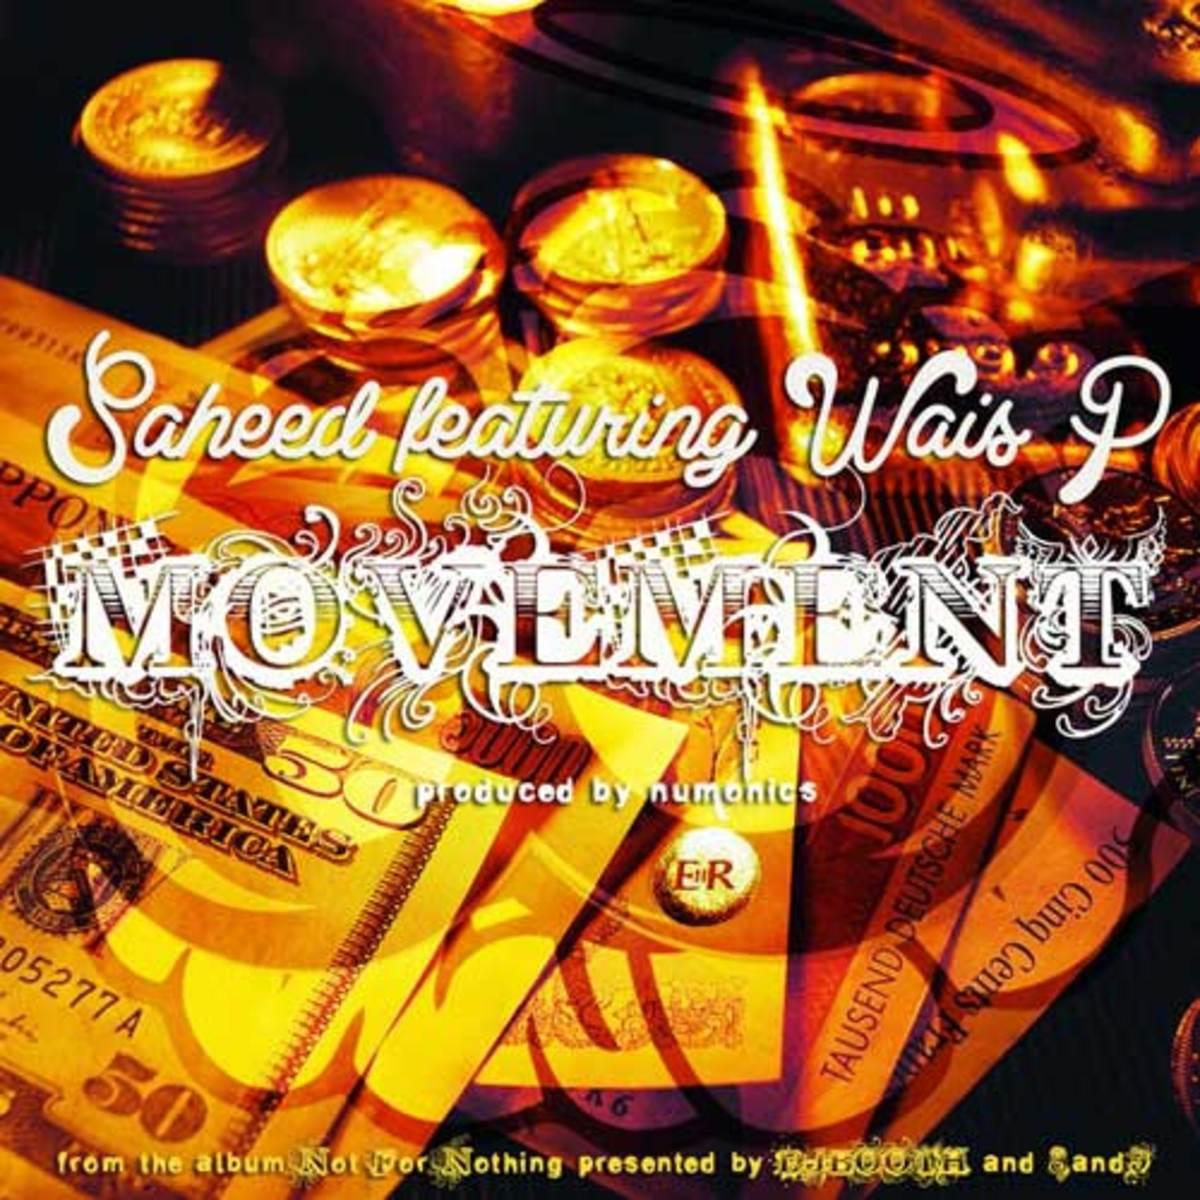 saheed-movement.jpg